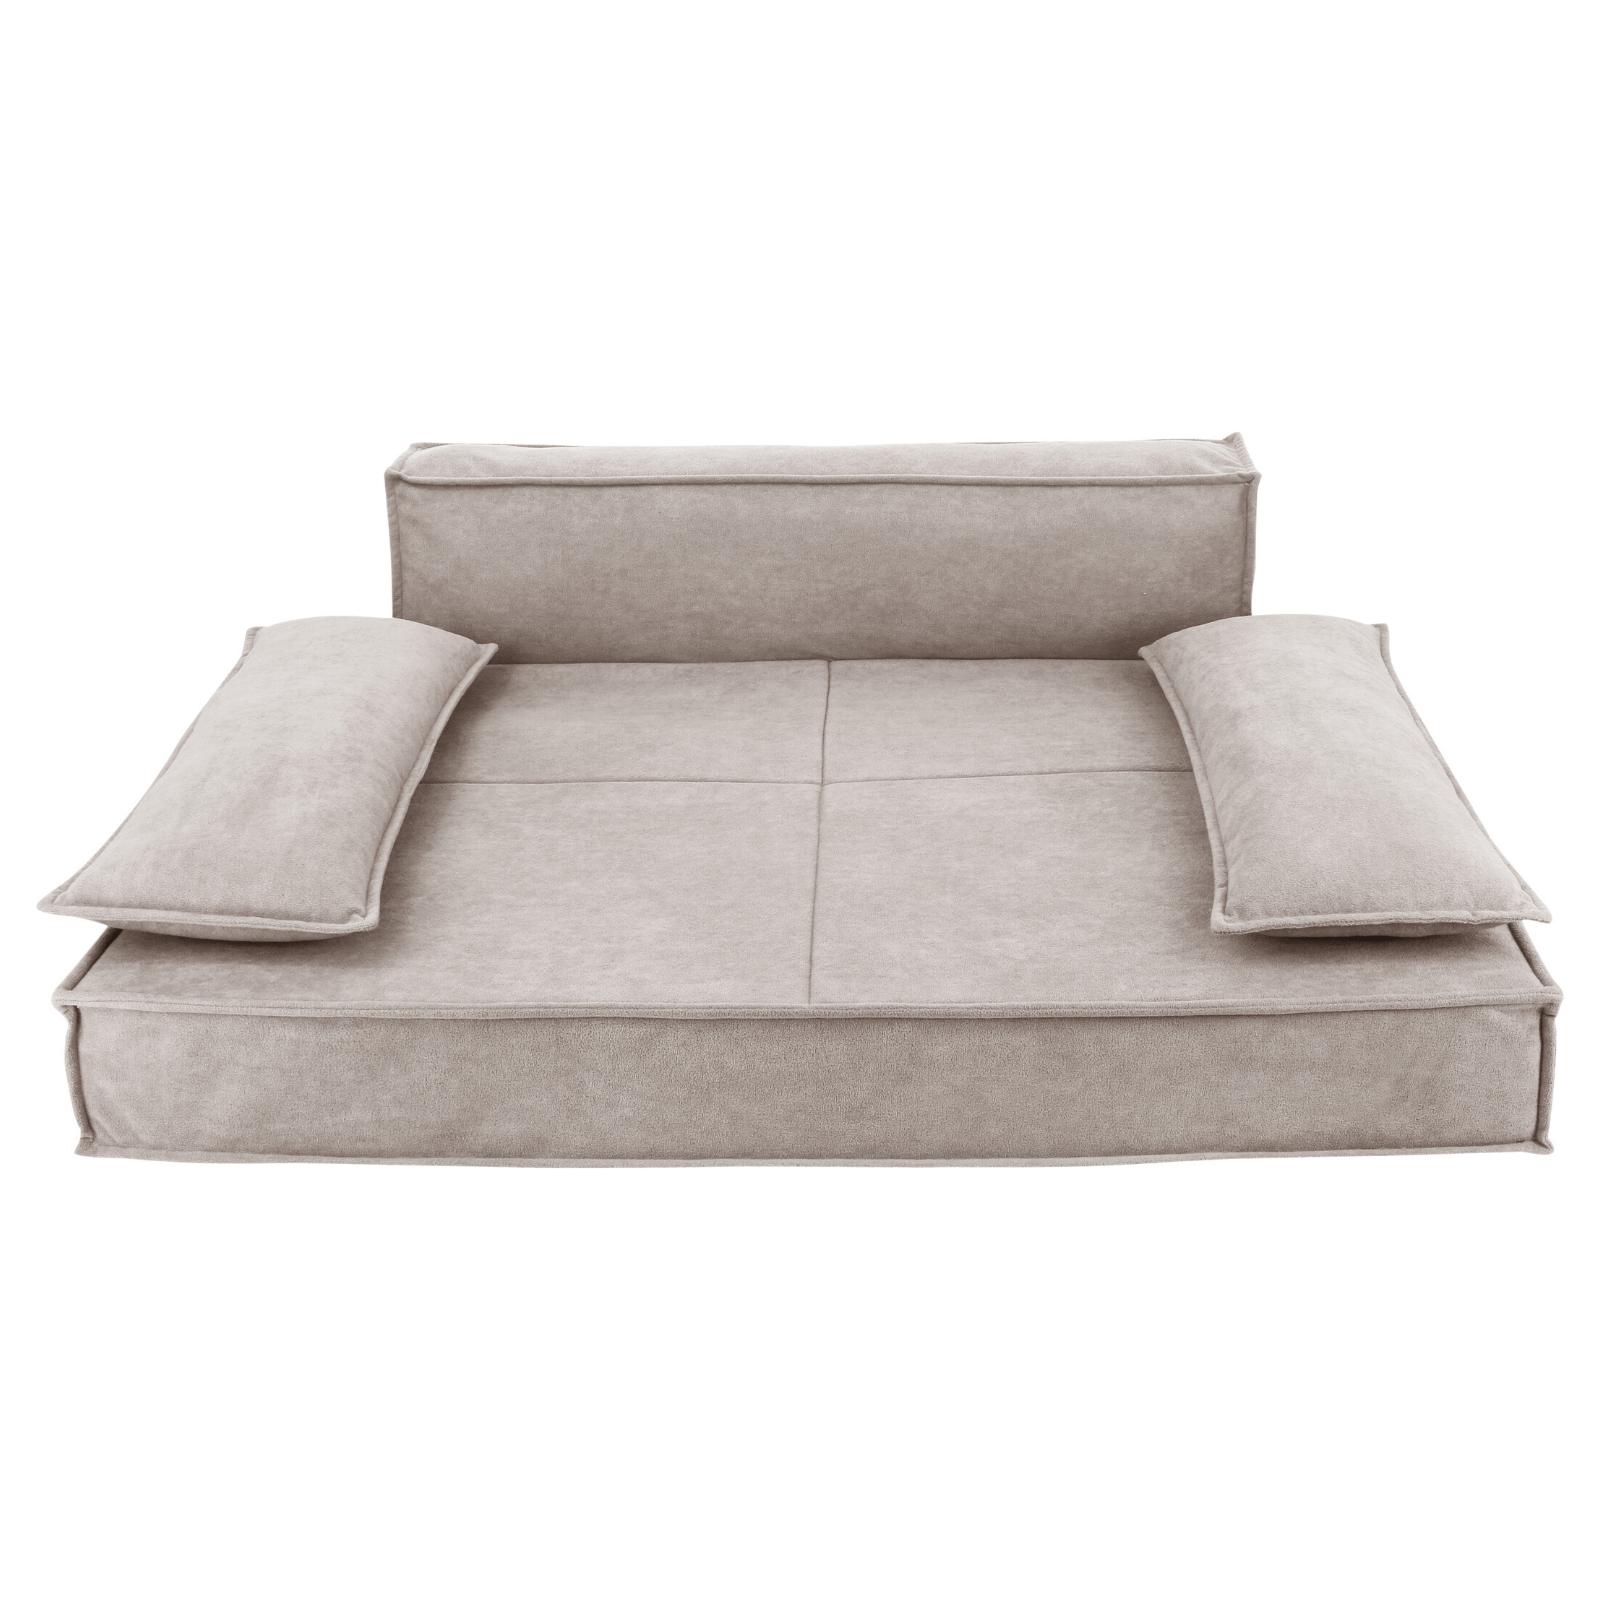 Orthopedic Sofa Pet Bed in Oatmeal